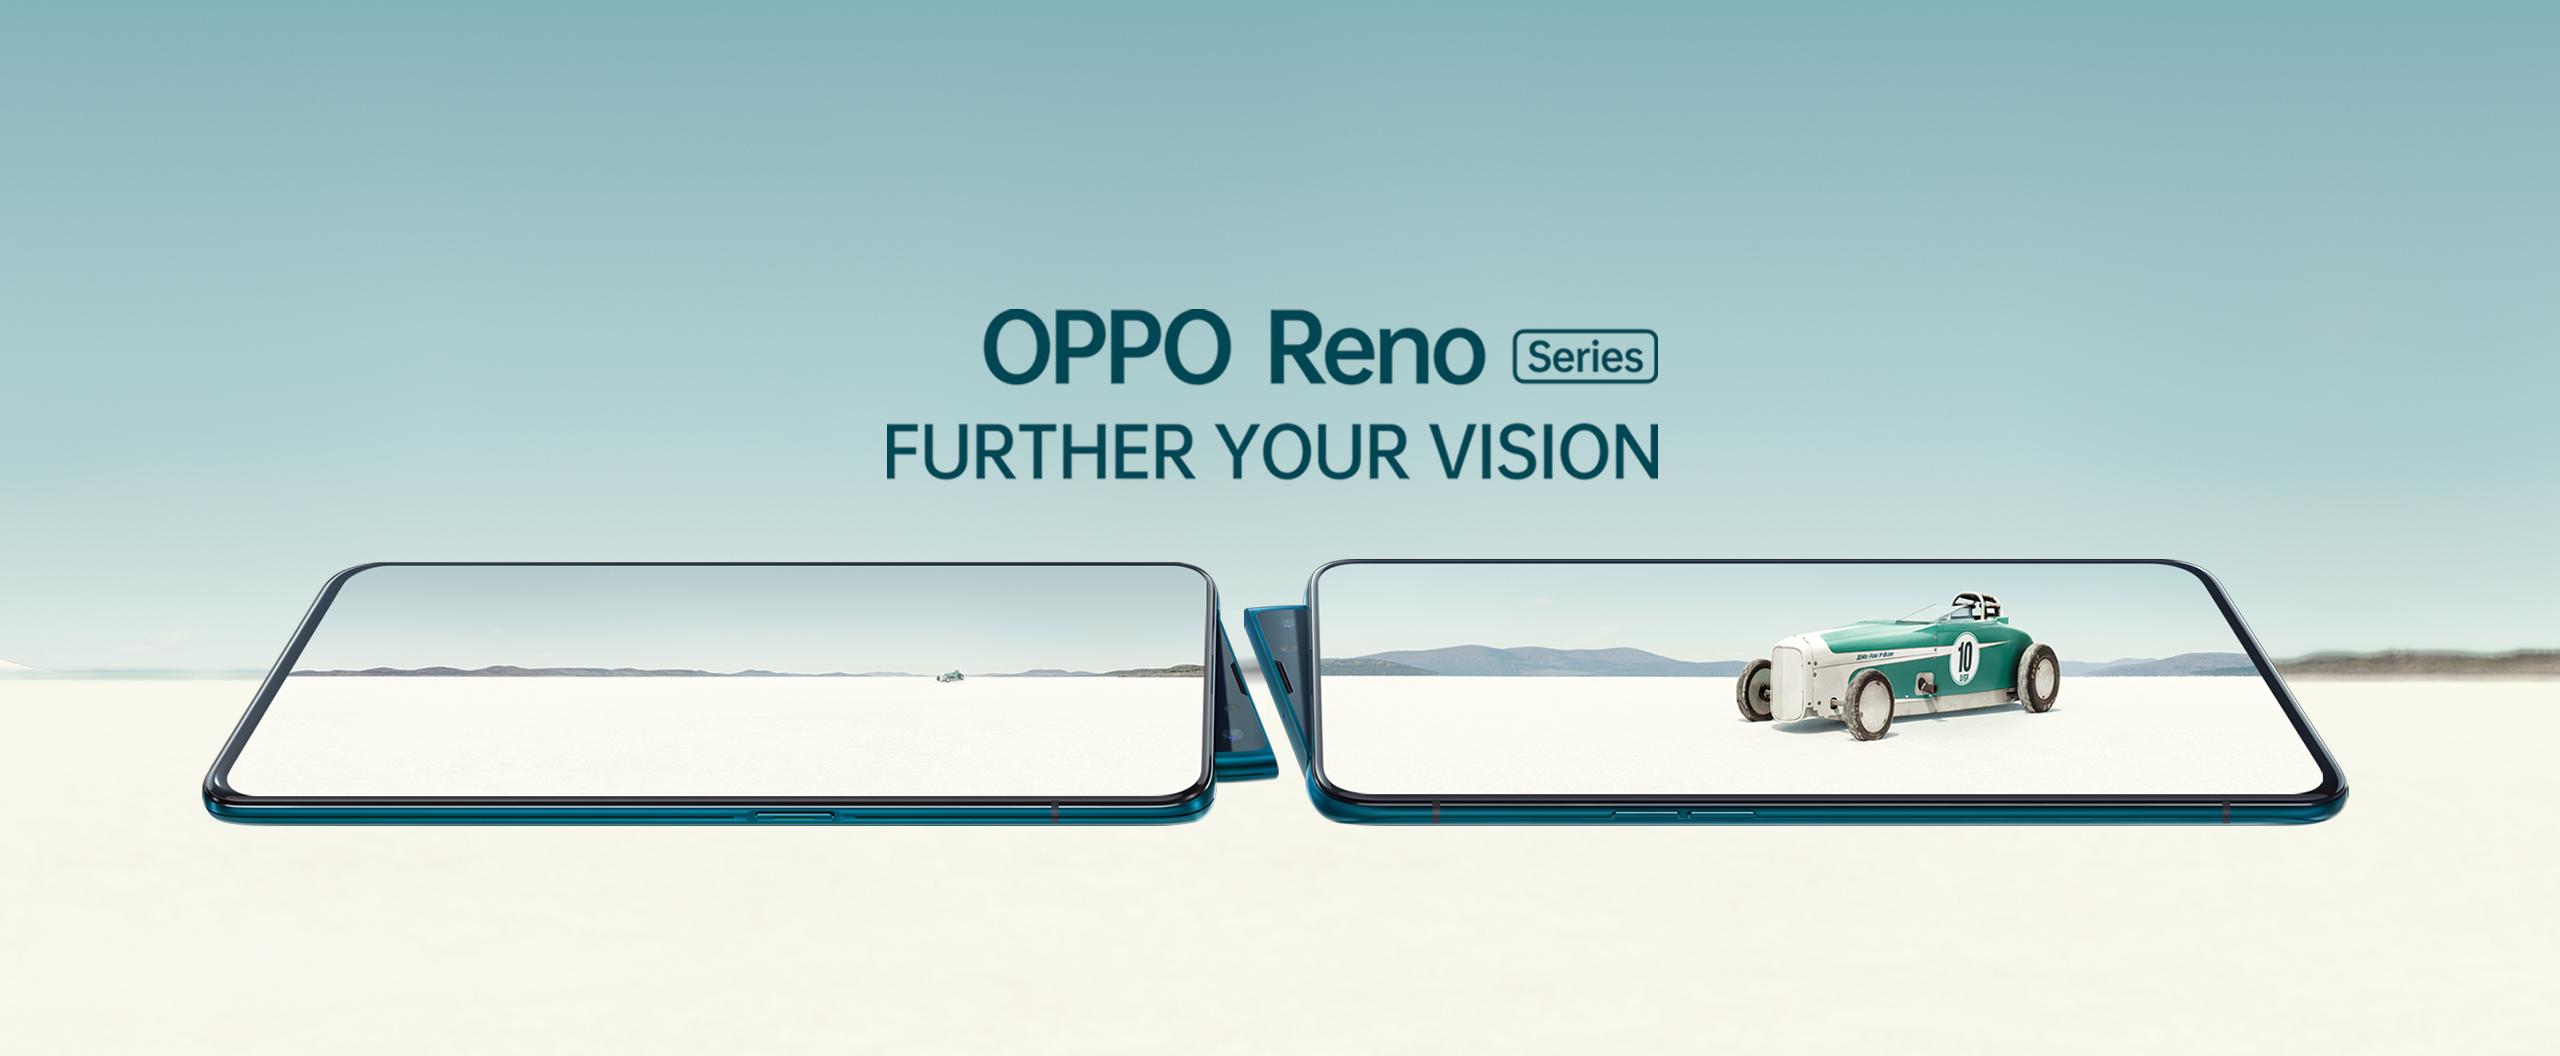 OPPO Mobile for Smartphones & Accessories | OPPO Bangladesh